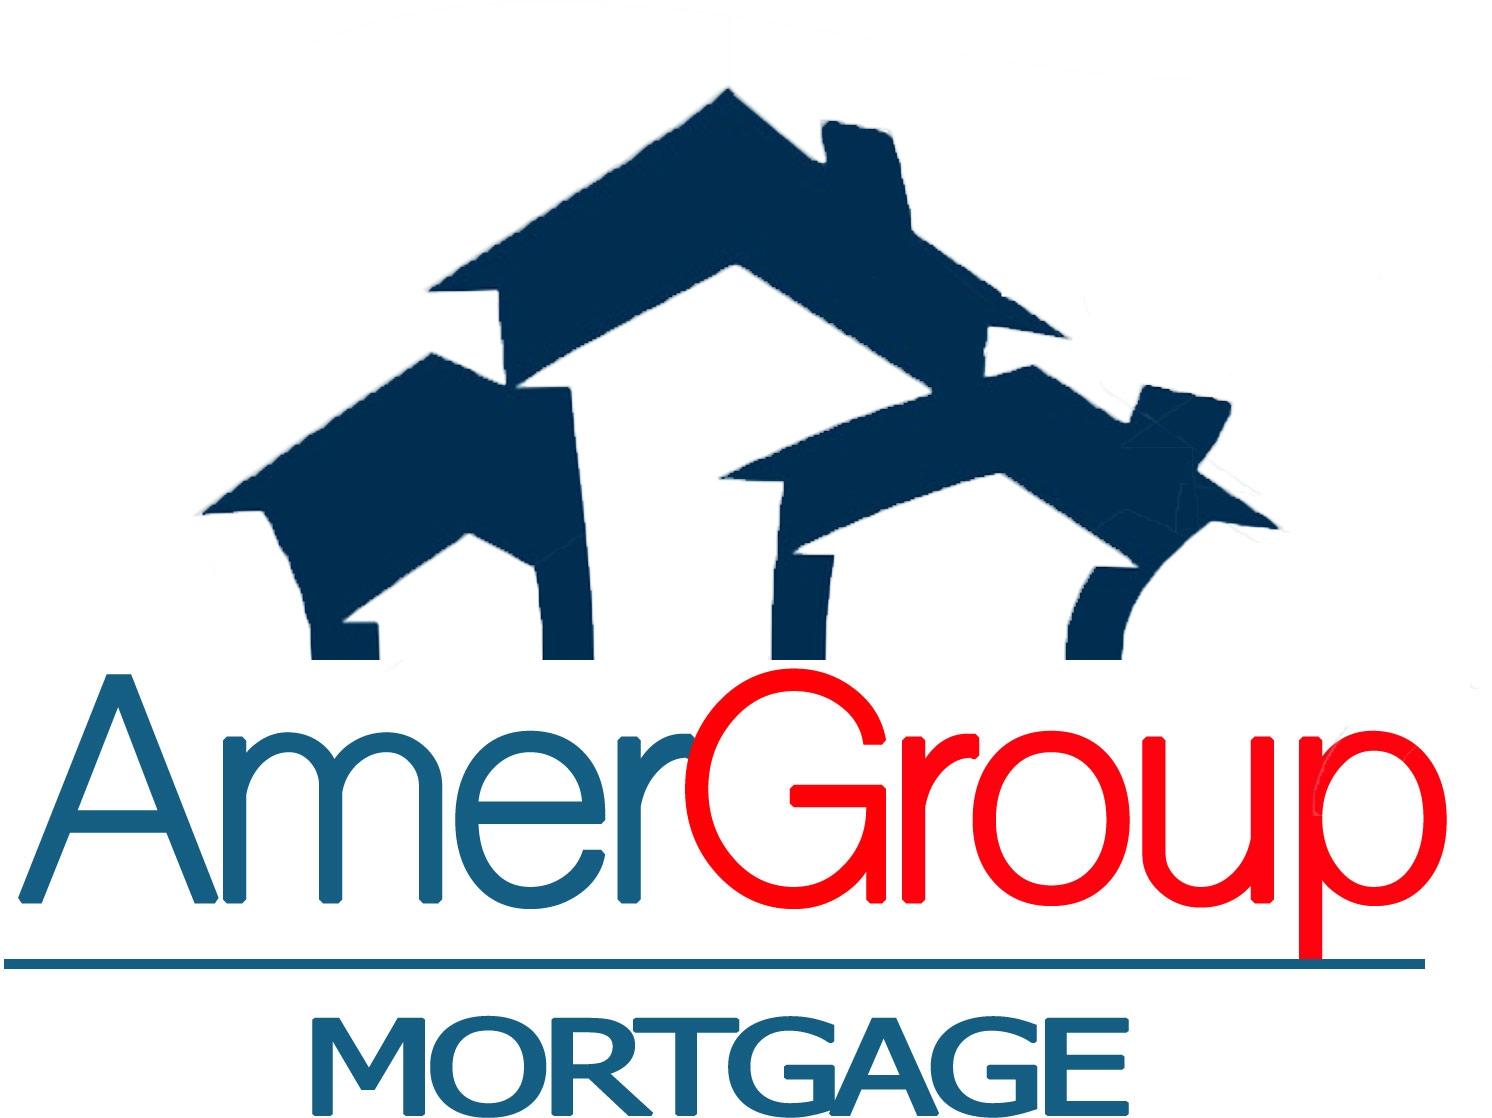 Amergroup Mortgage Corp